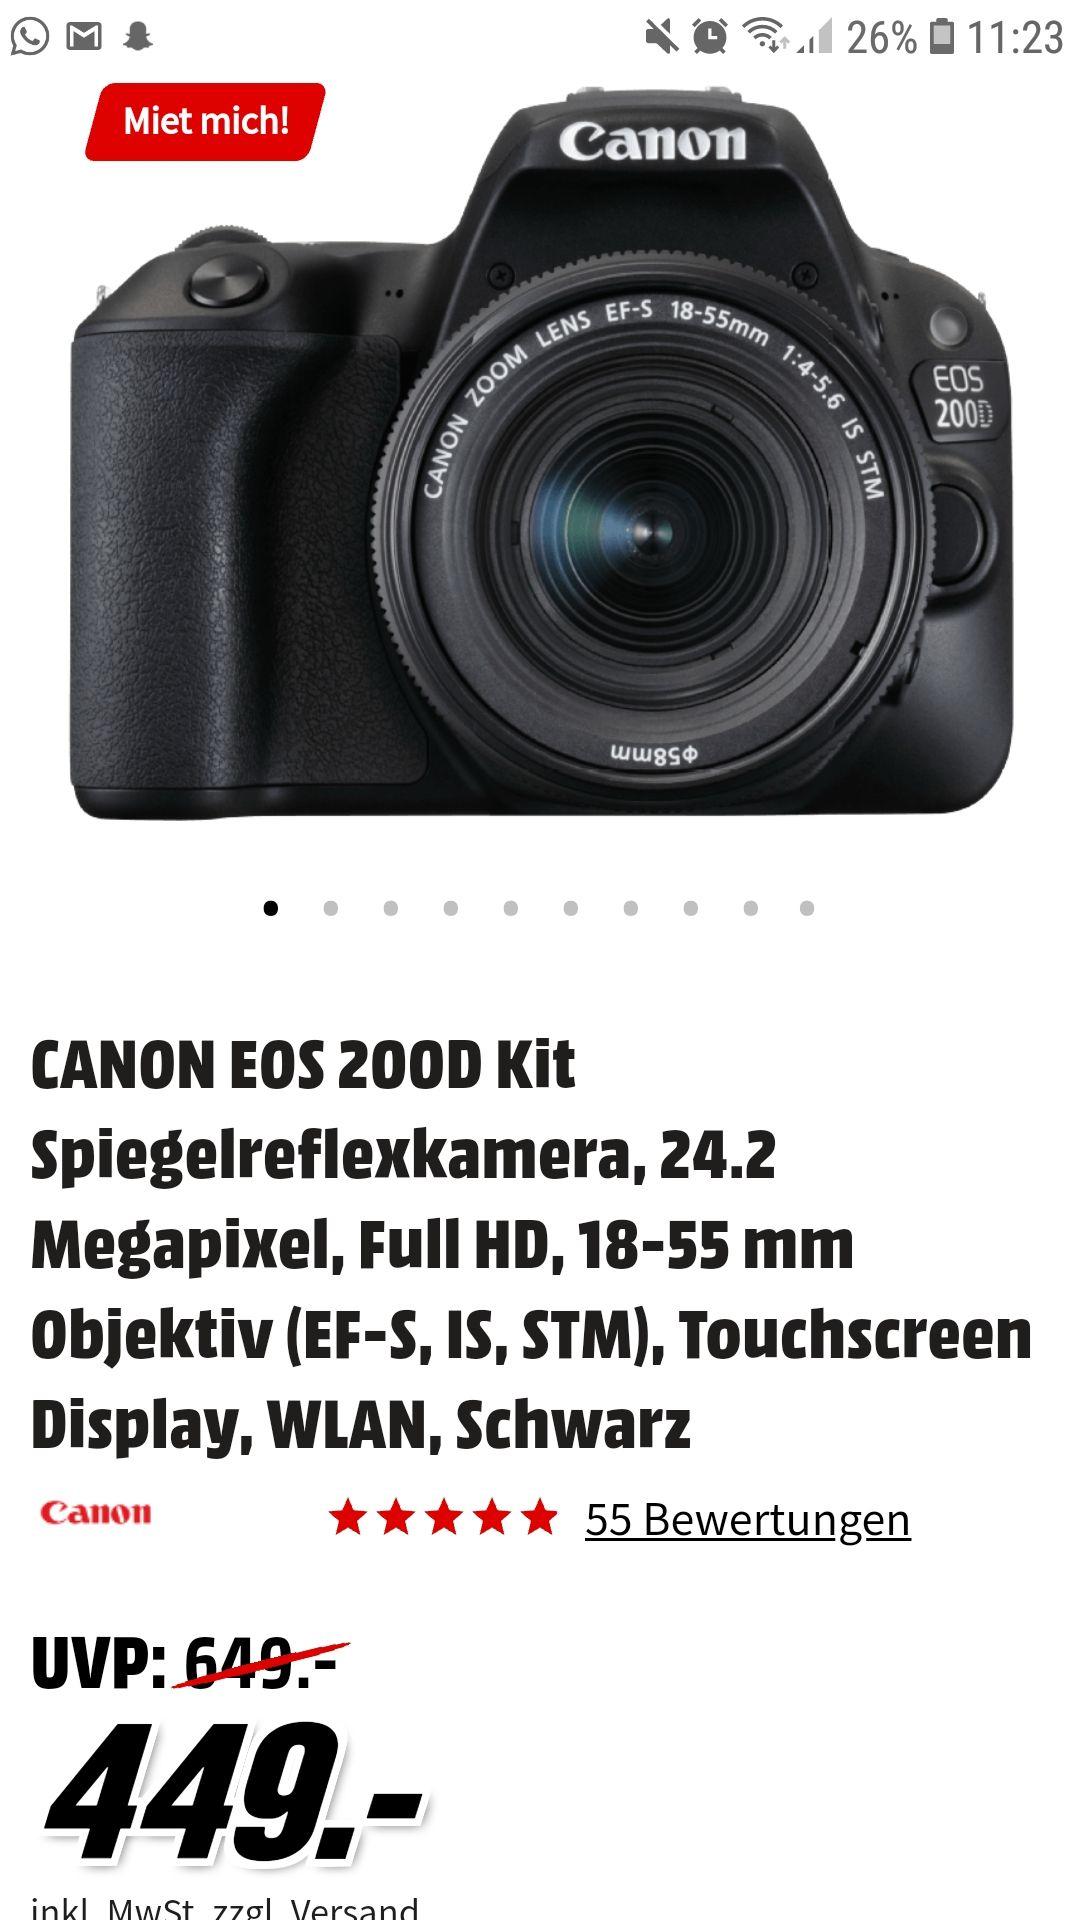 Canon EOS 200d mit 18-55mm IS STM Objektiv (Media Markt)